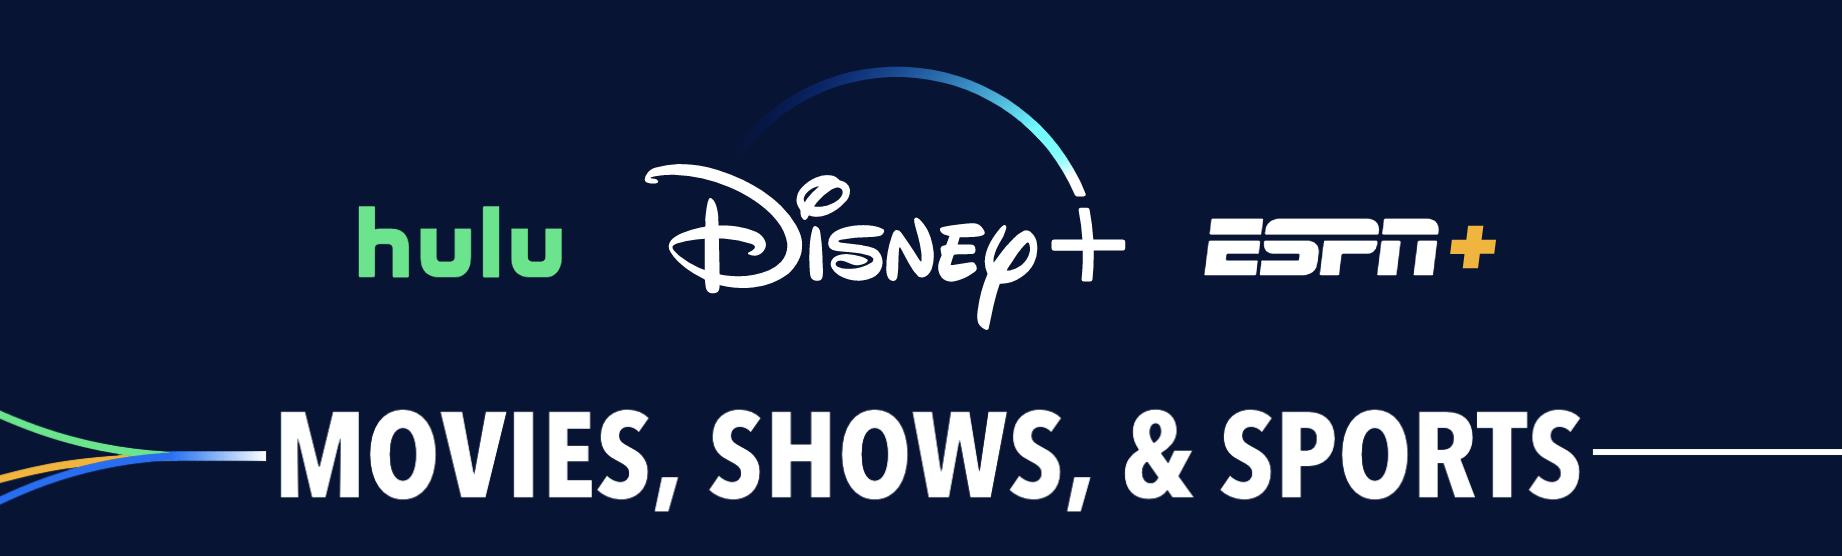 Hulu, Disney+ andESPN+ Subscription, best gifts for men